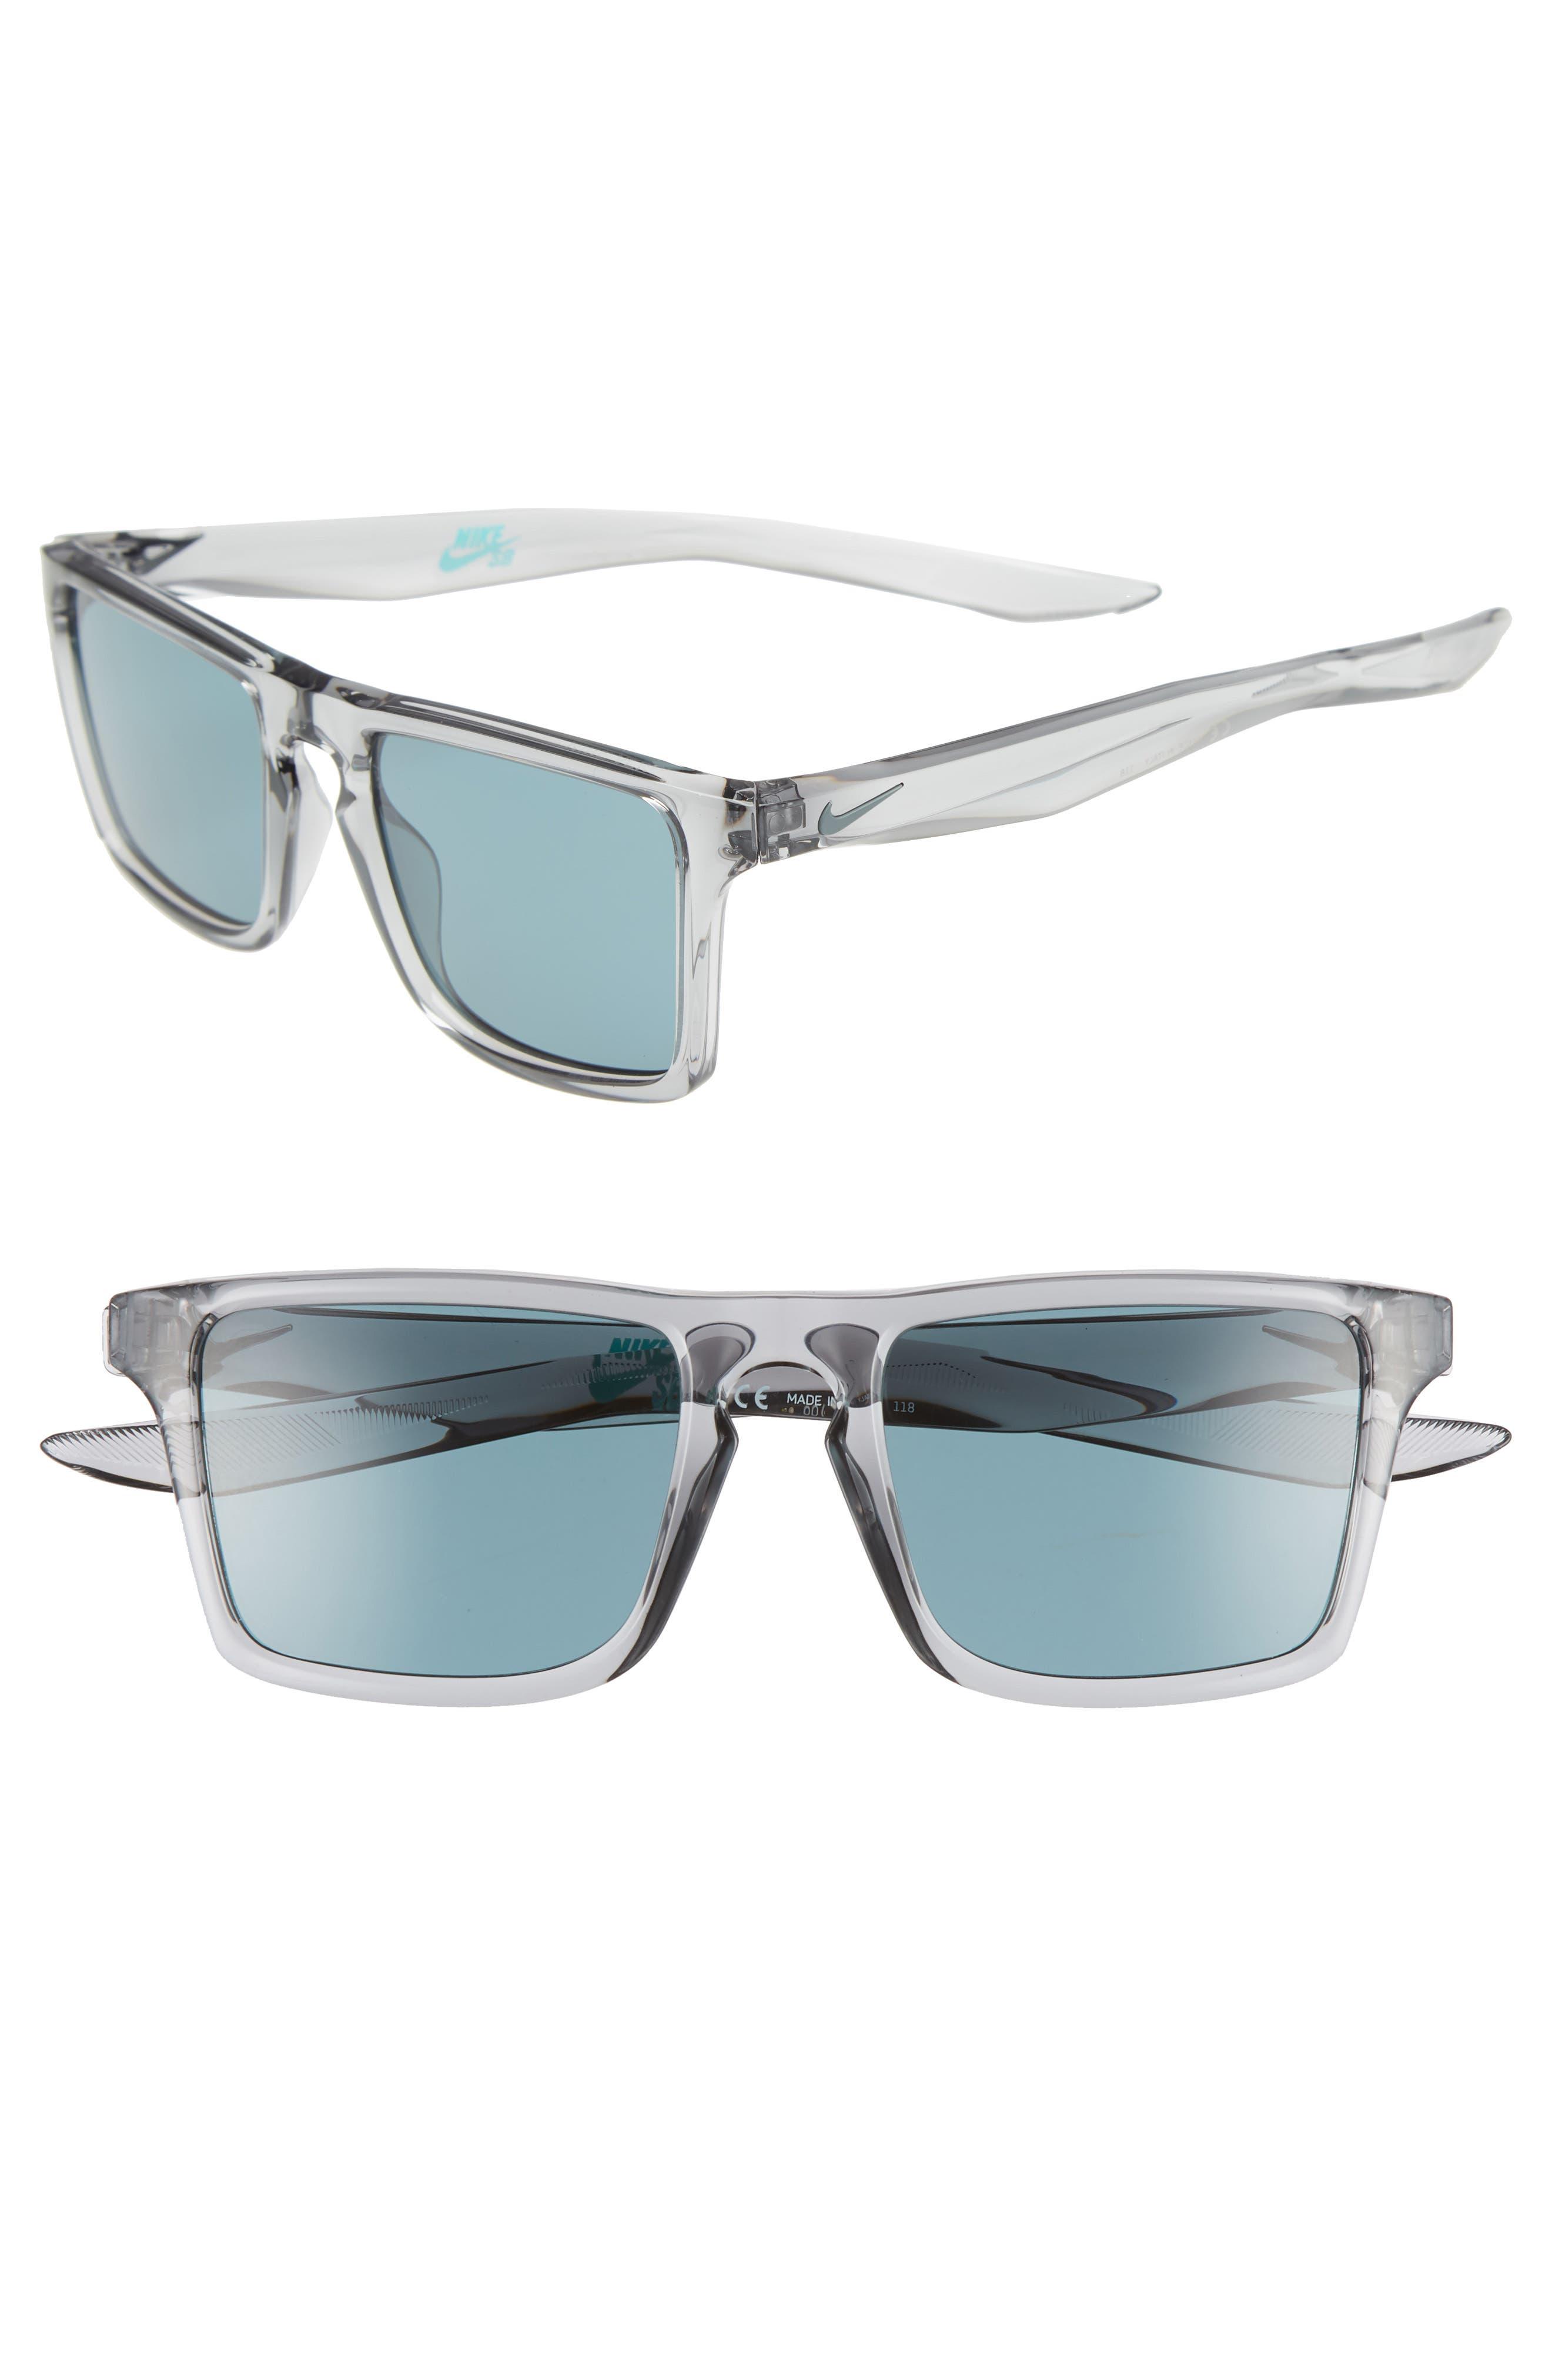 Nike Verge 52Mm Sunglasses - Wolf Grey/ Teal